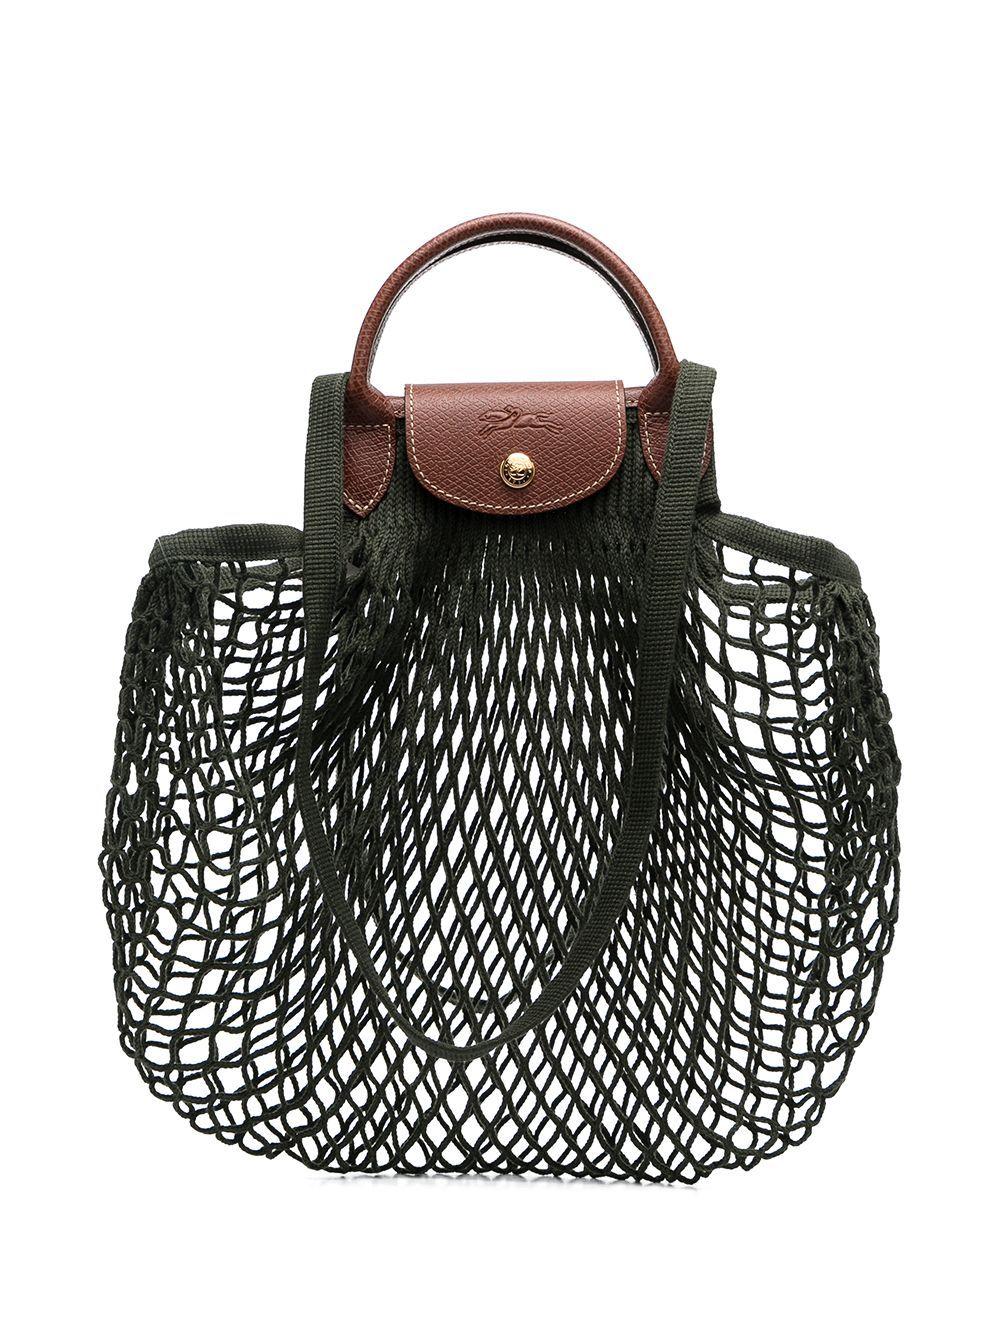 Longchamp Le Pliage Filet Pure Cotton Tote Bag - Farfetch in 2021 ...